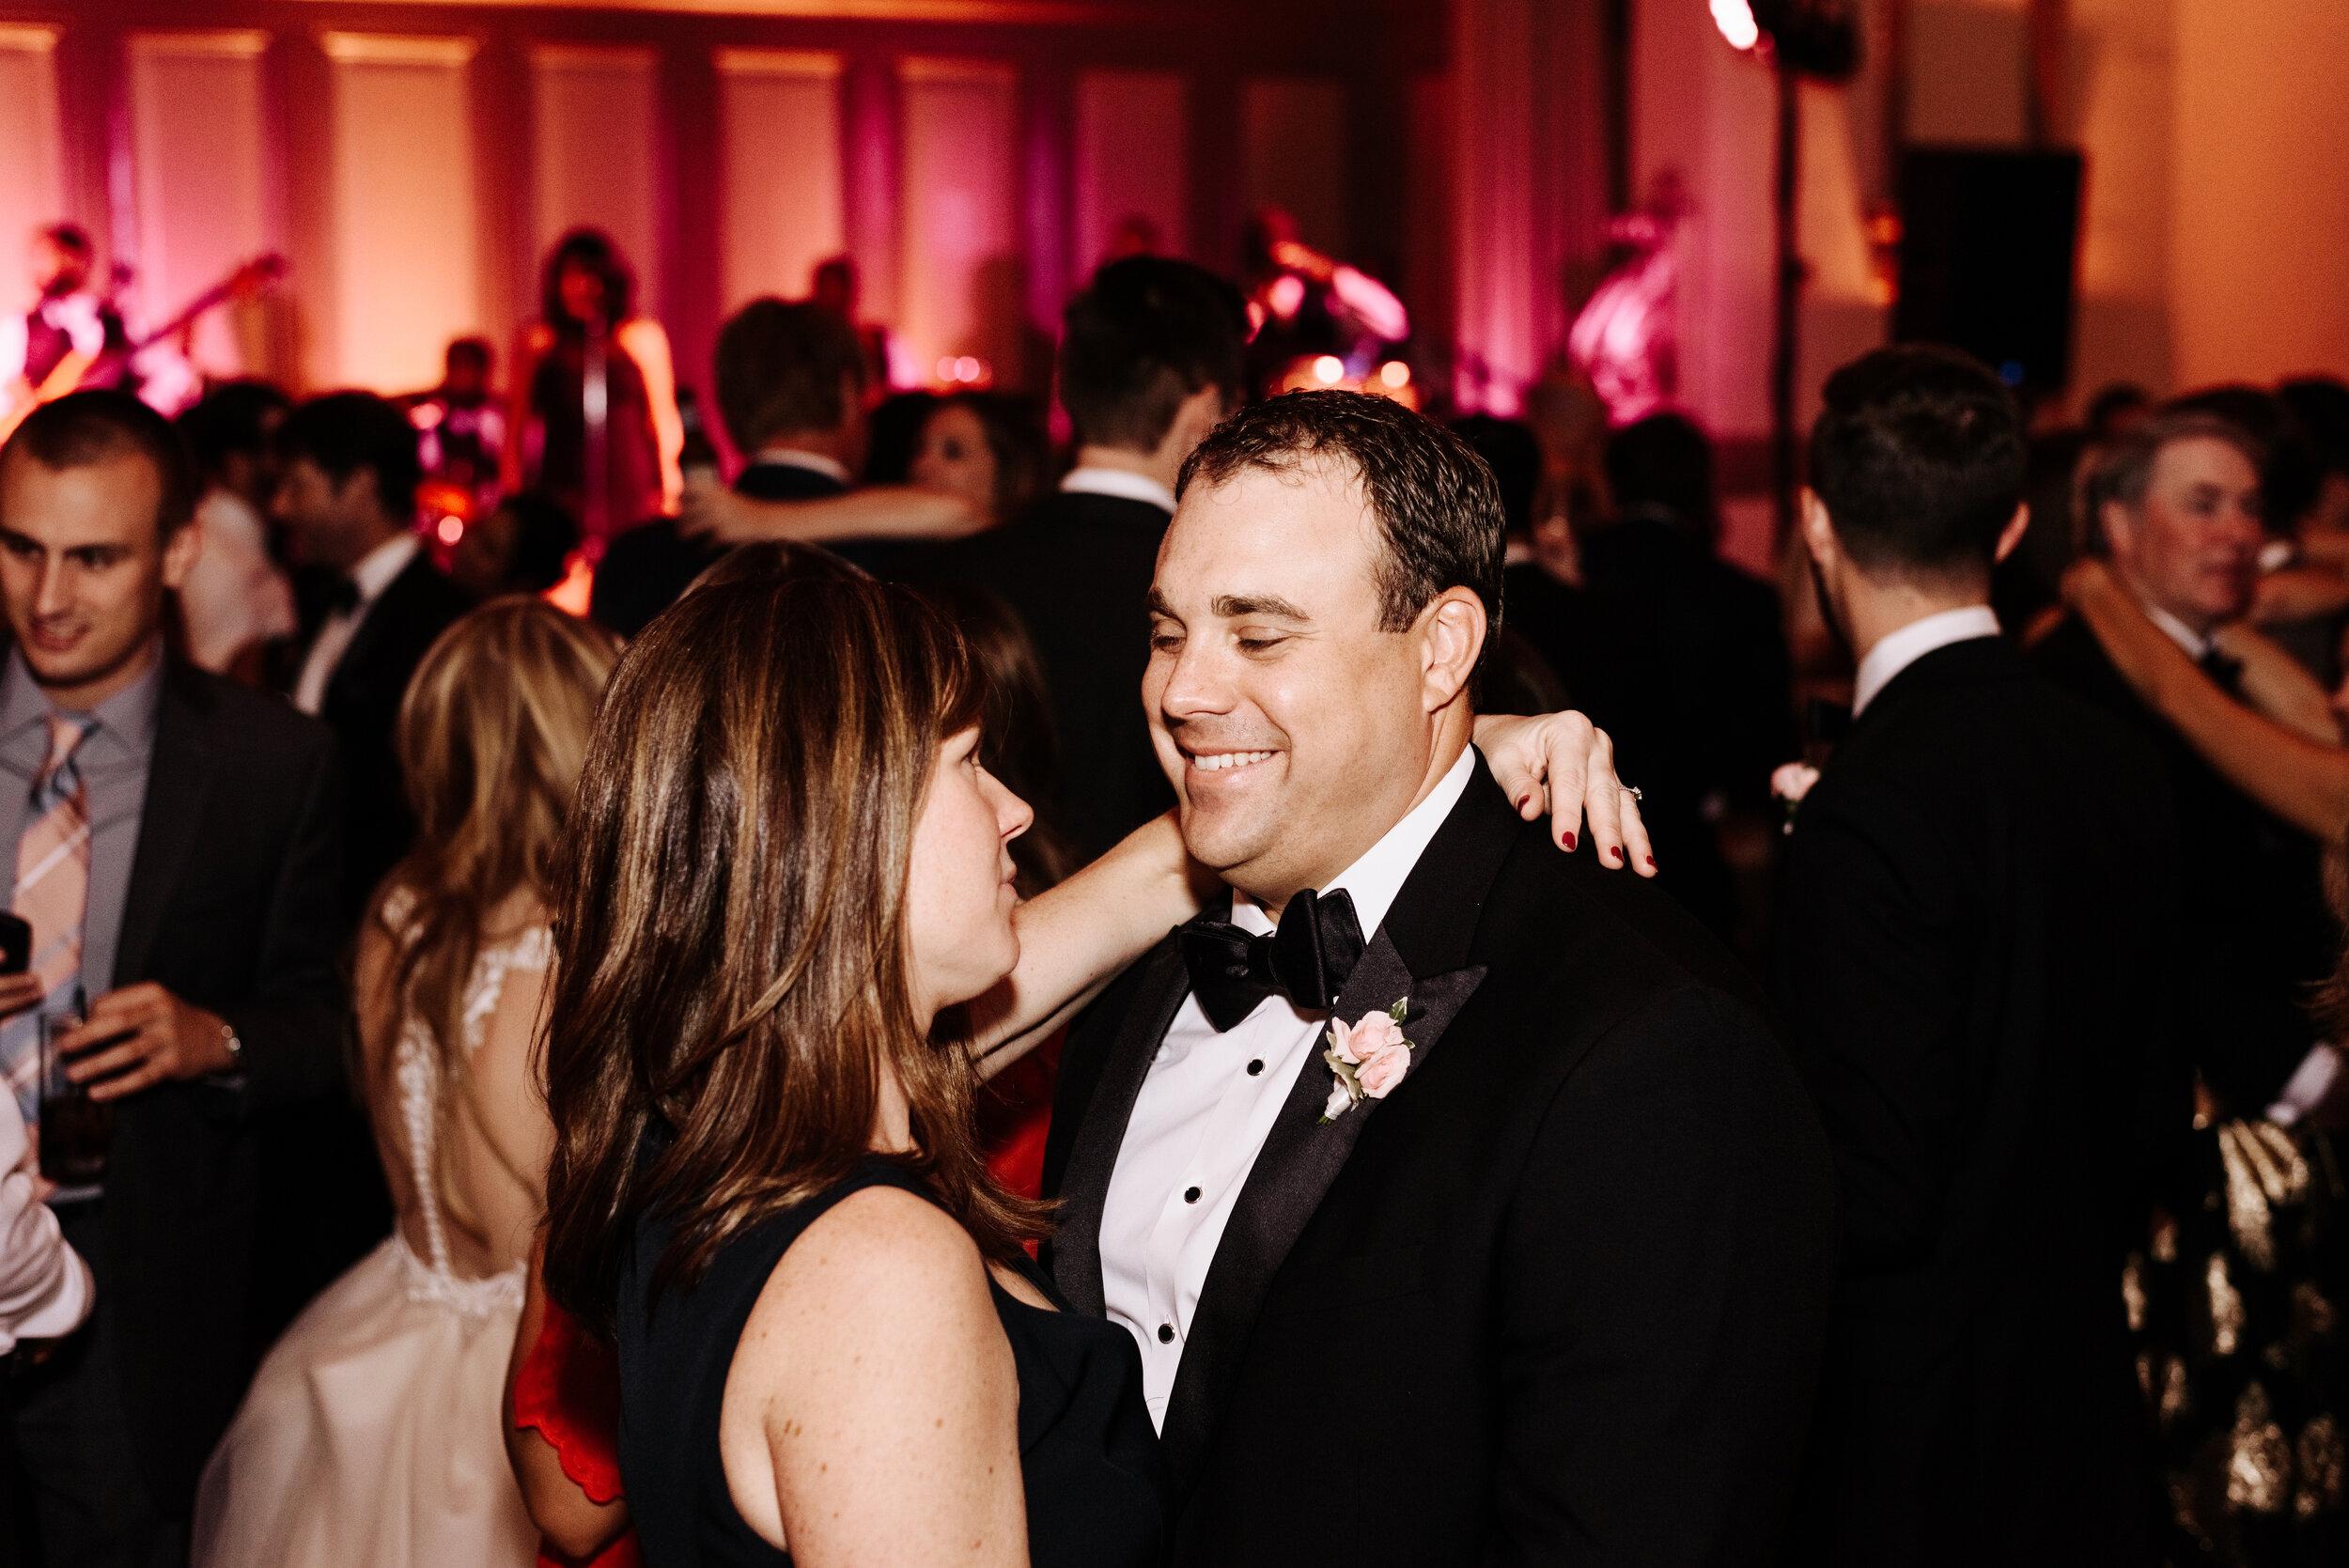 Cassie-Mrunal-Wedding-Quirk-Hotel-John-Marshall-Ballrooms-Richmond-Virginia-Photography-by-V-112.jpg